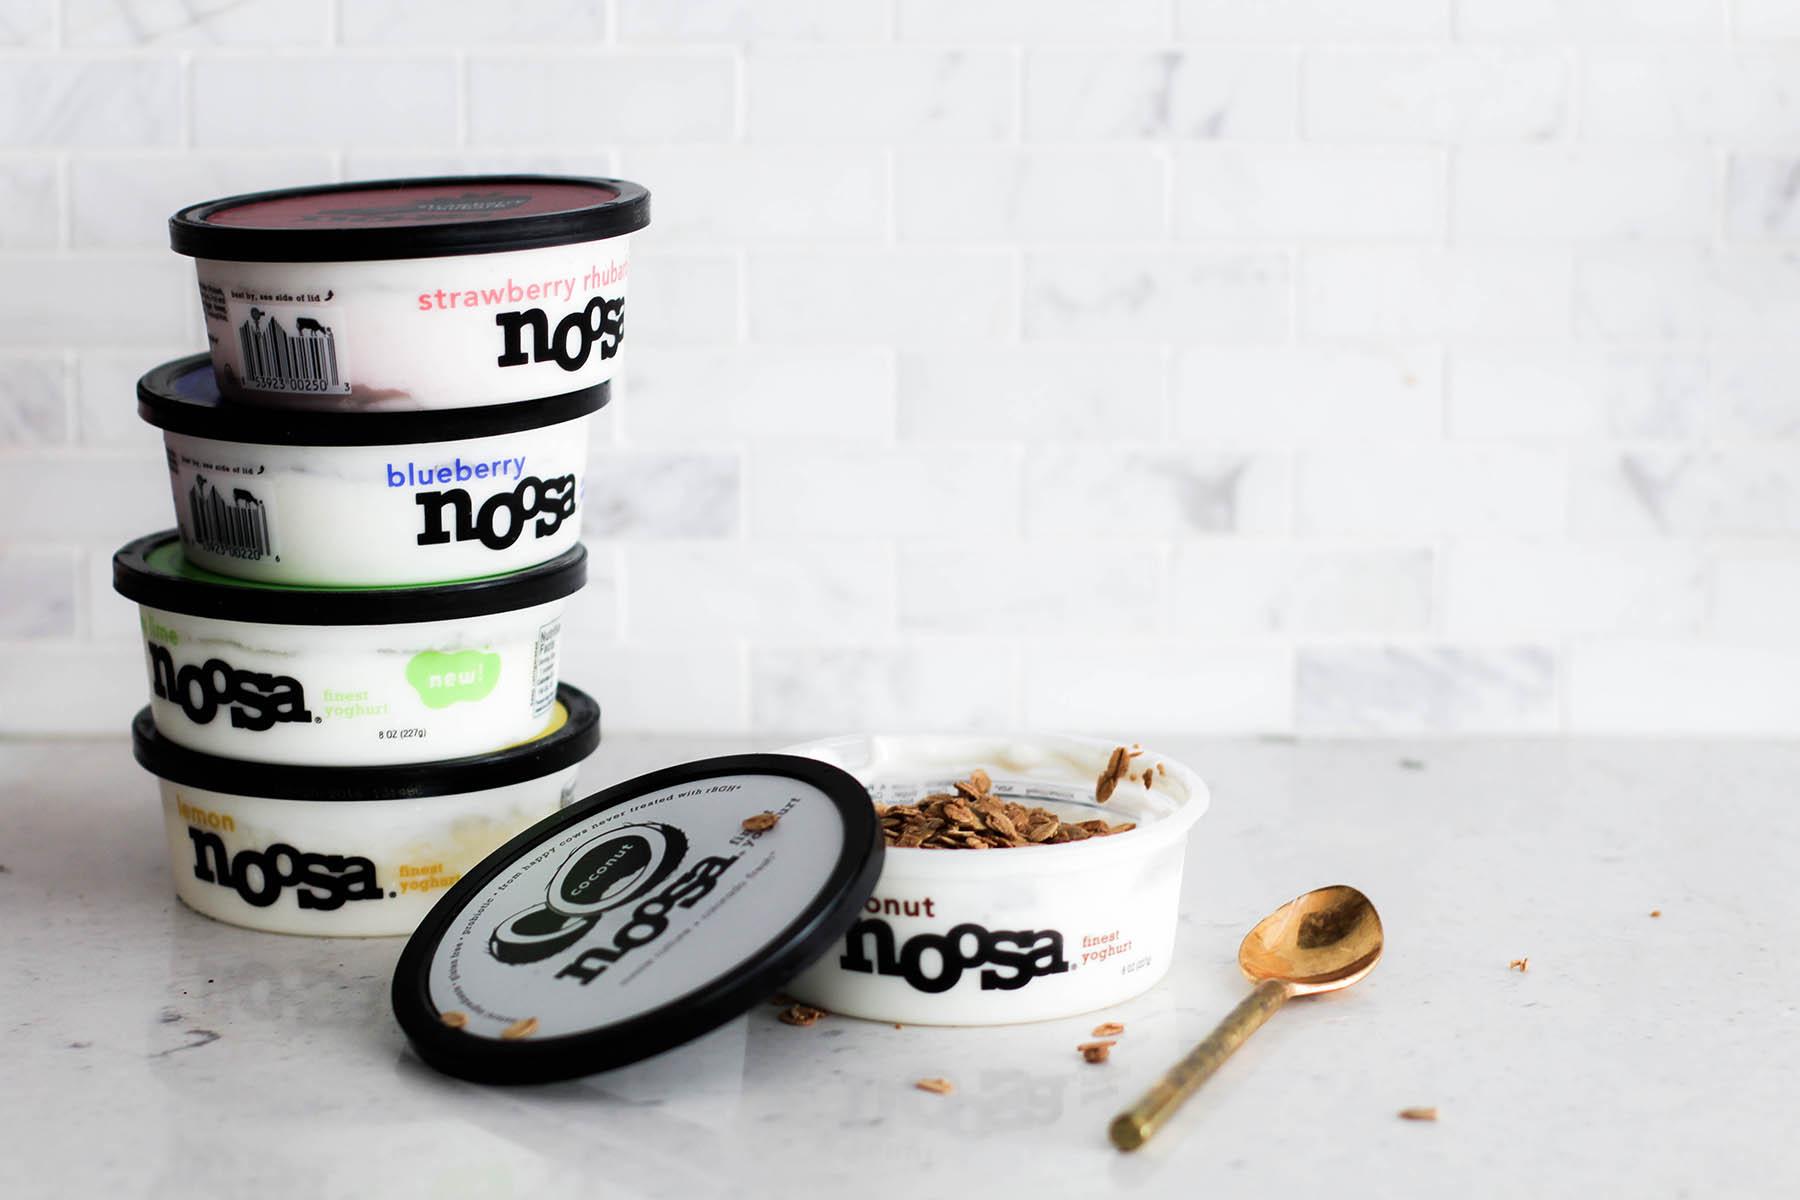 noosa yoghurt on white marble kitchen counter